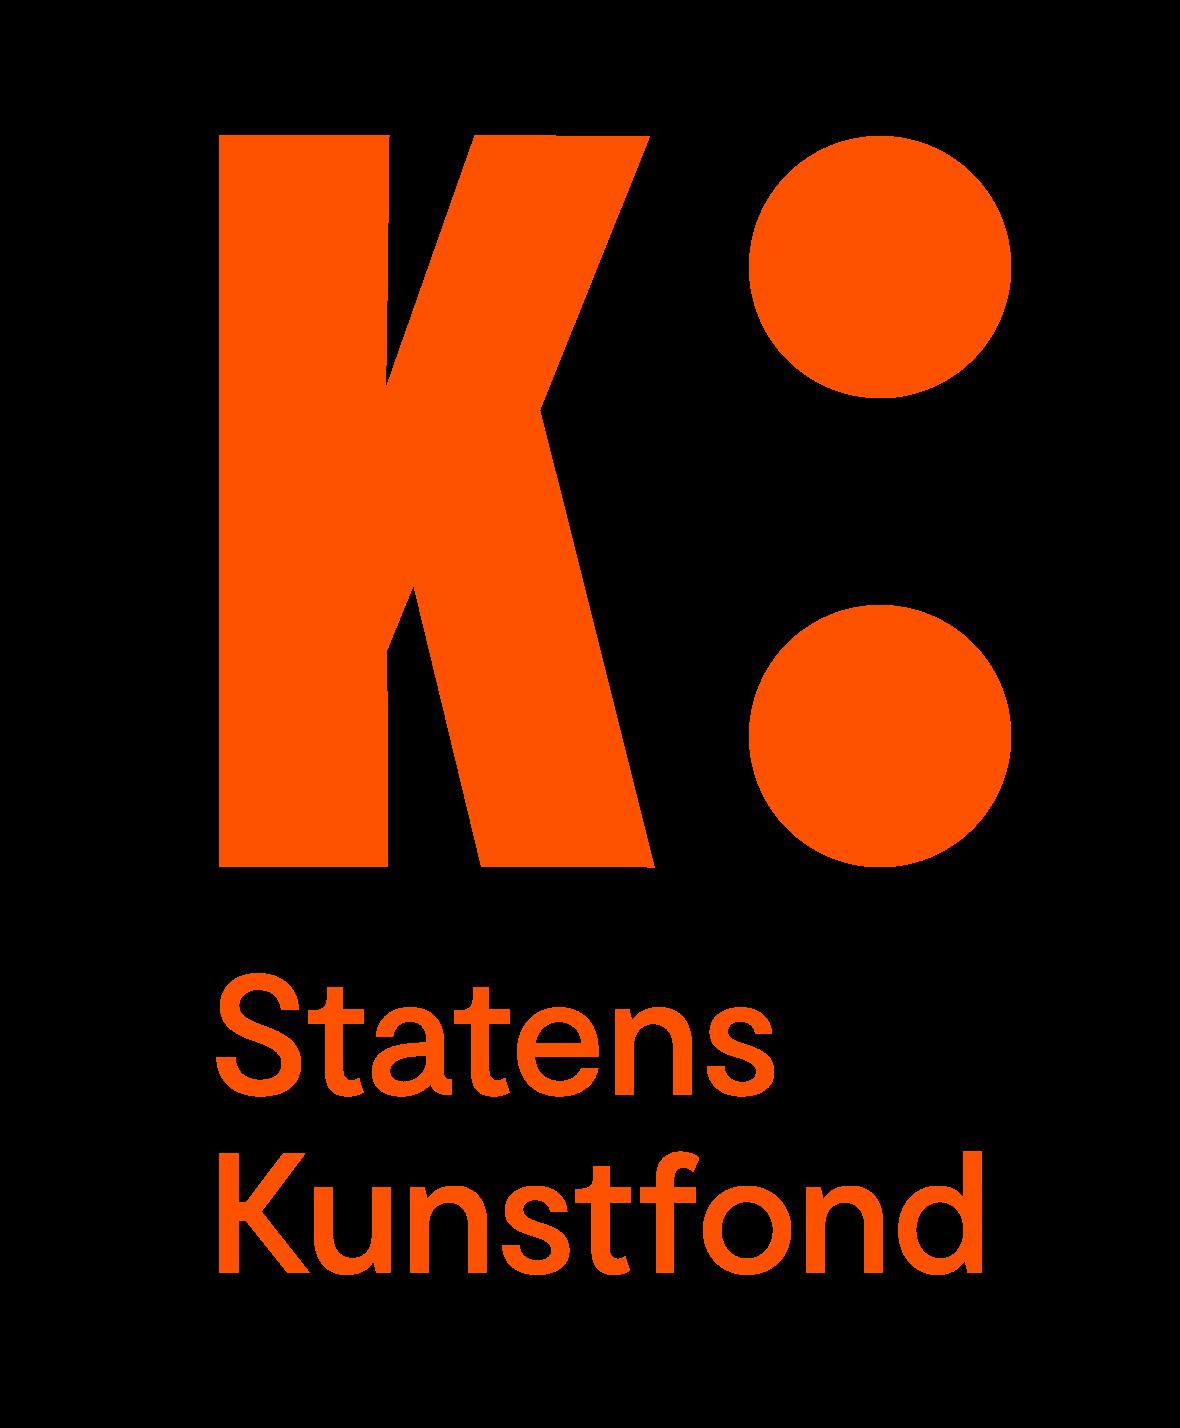 Tak til Statens Kunstfond for støtte til både KP20 & SPRING20